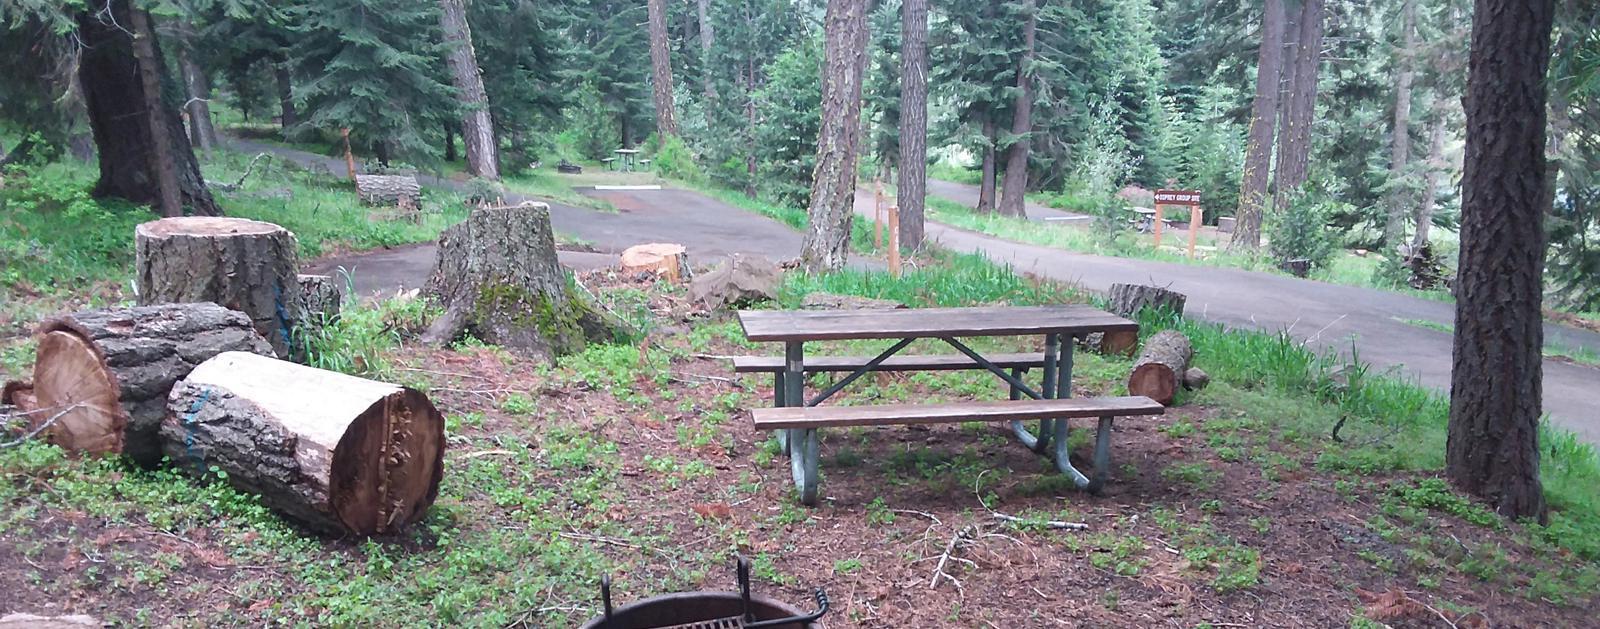 Campsite C40- Hyatt LakeCampsite 40, C Loop Hyatt Lake